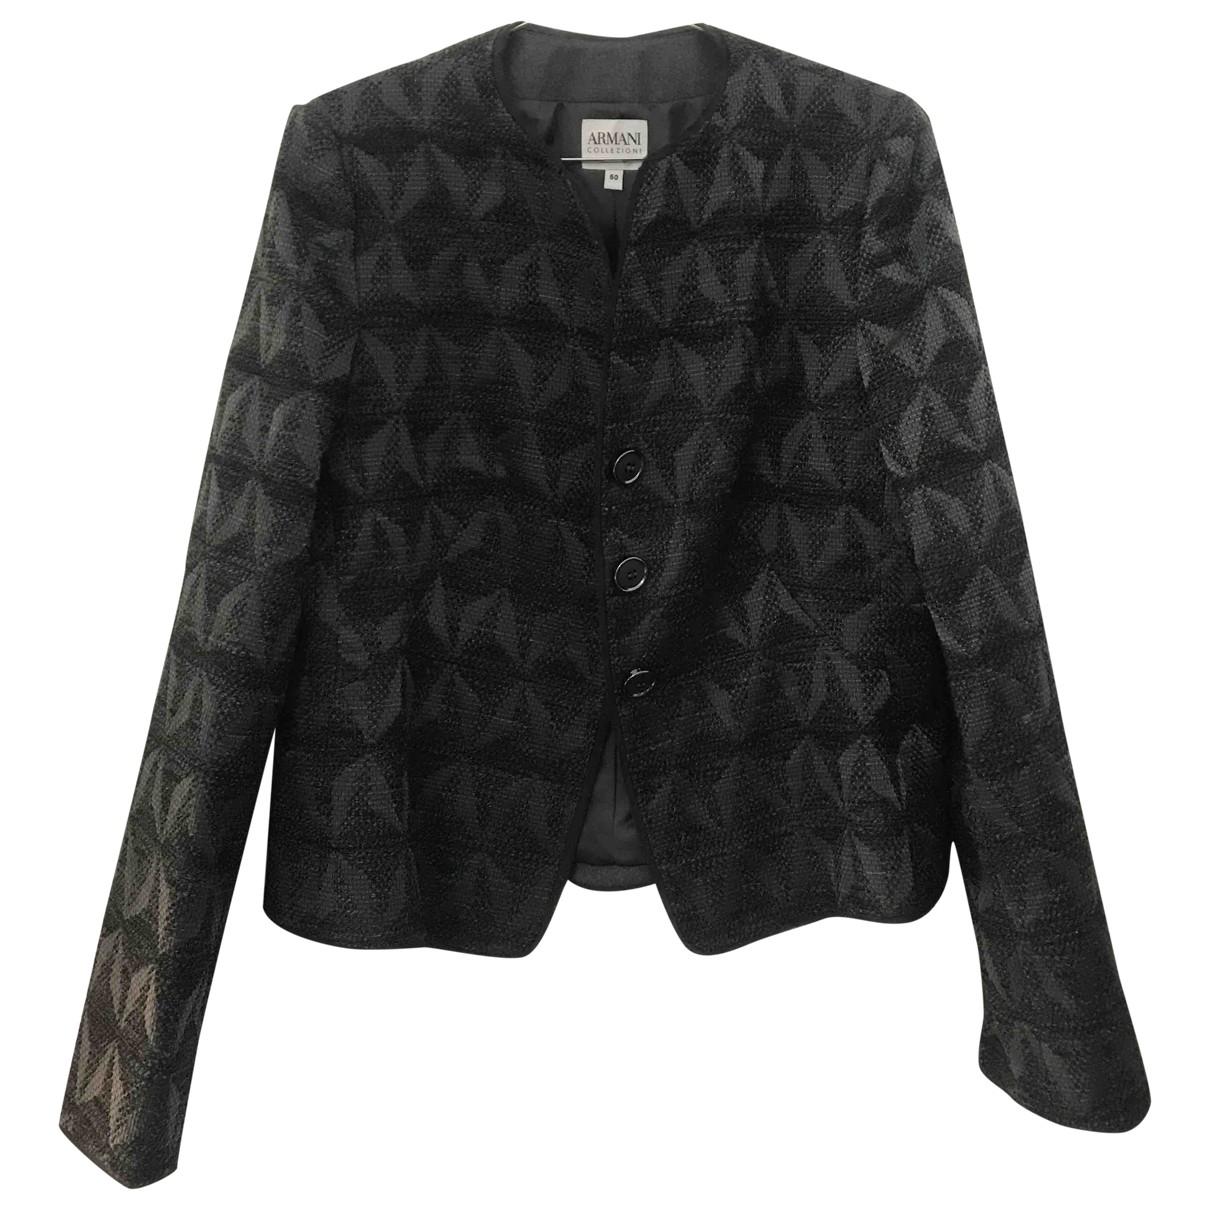 Armani Collezioni \N Grey Wool jacket for Women 50-52 IT